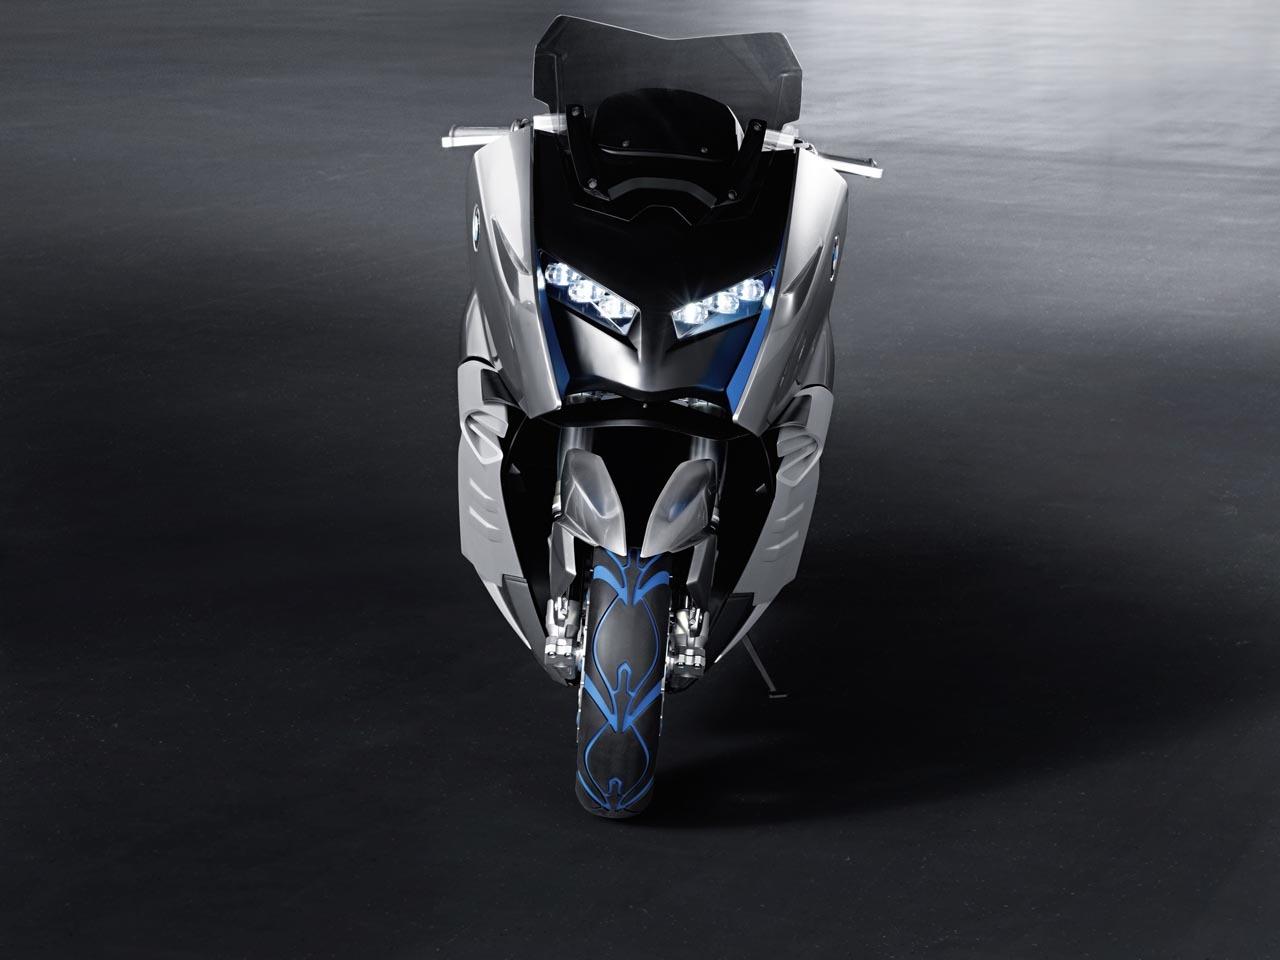 Foto de BMW Concept C Scooter, el Scooter del futuro según BMW (5/19)